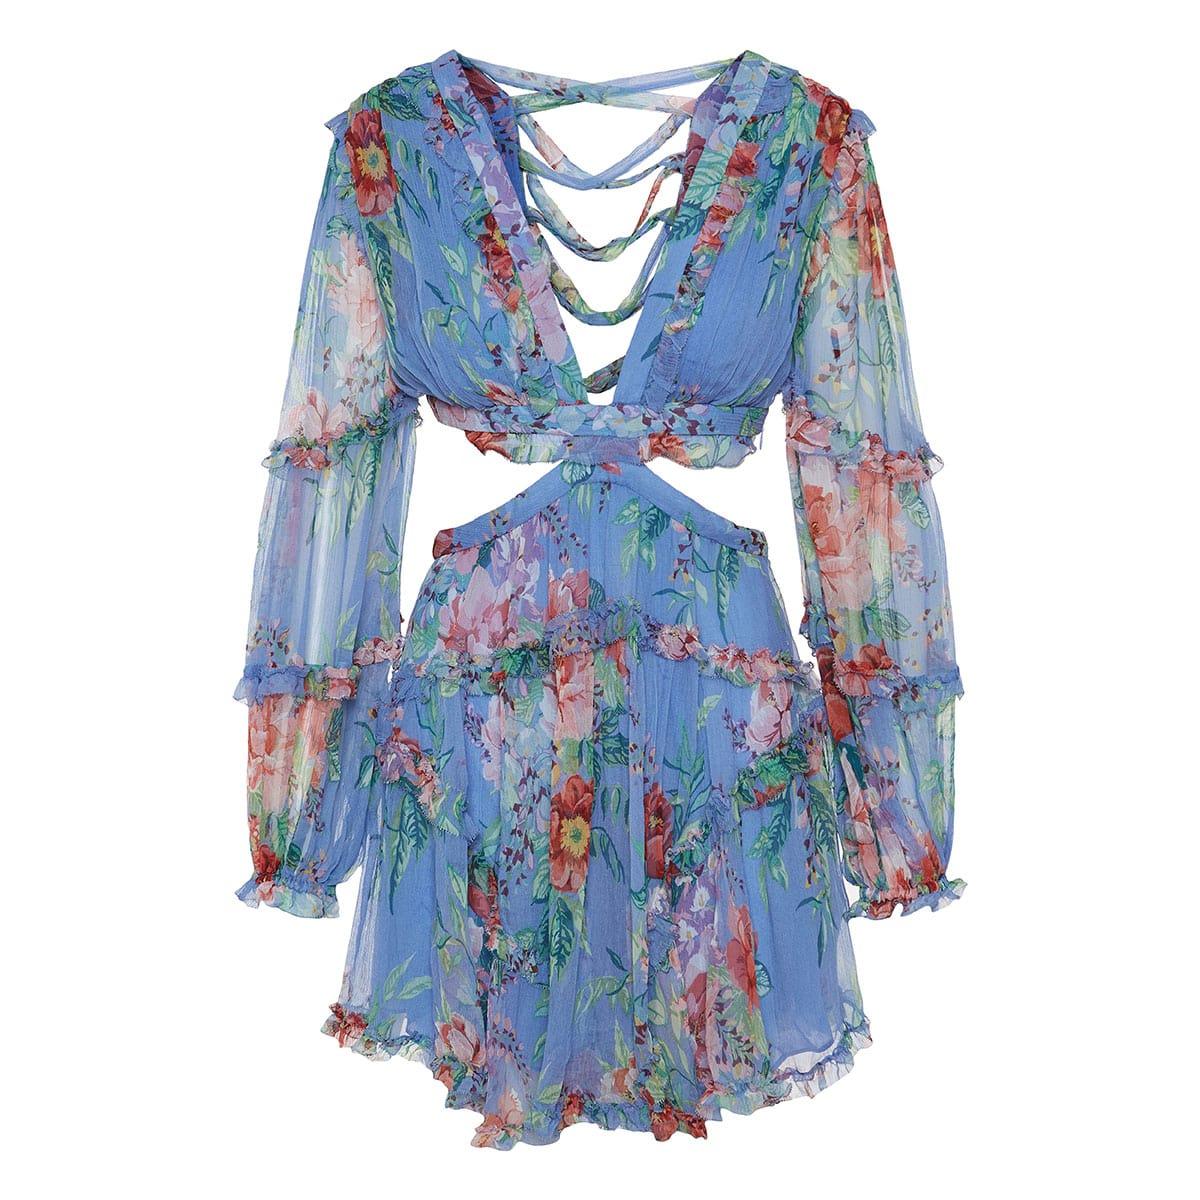 Bellitude cut-out floral chiffon mini dress